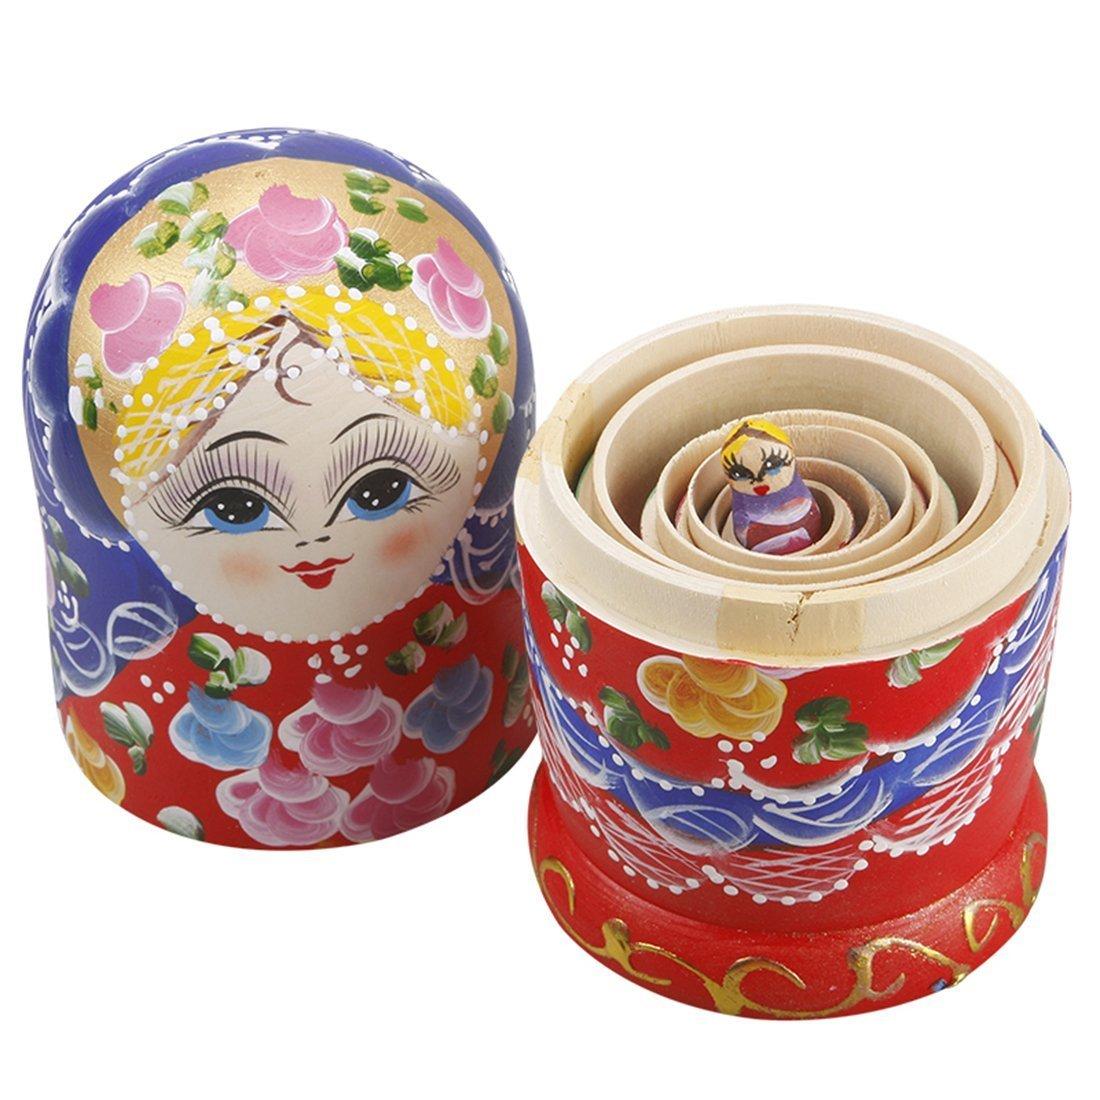 Youbedo 7pcs Blue Flower Madness Nesting Dolls Authentic Russian Wooden Matryoshka by Youbedo